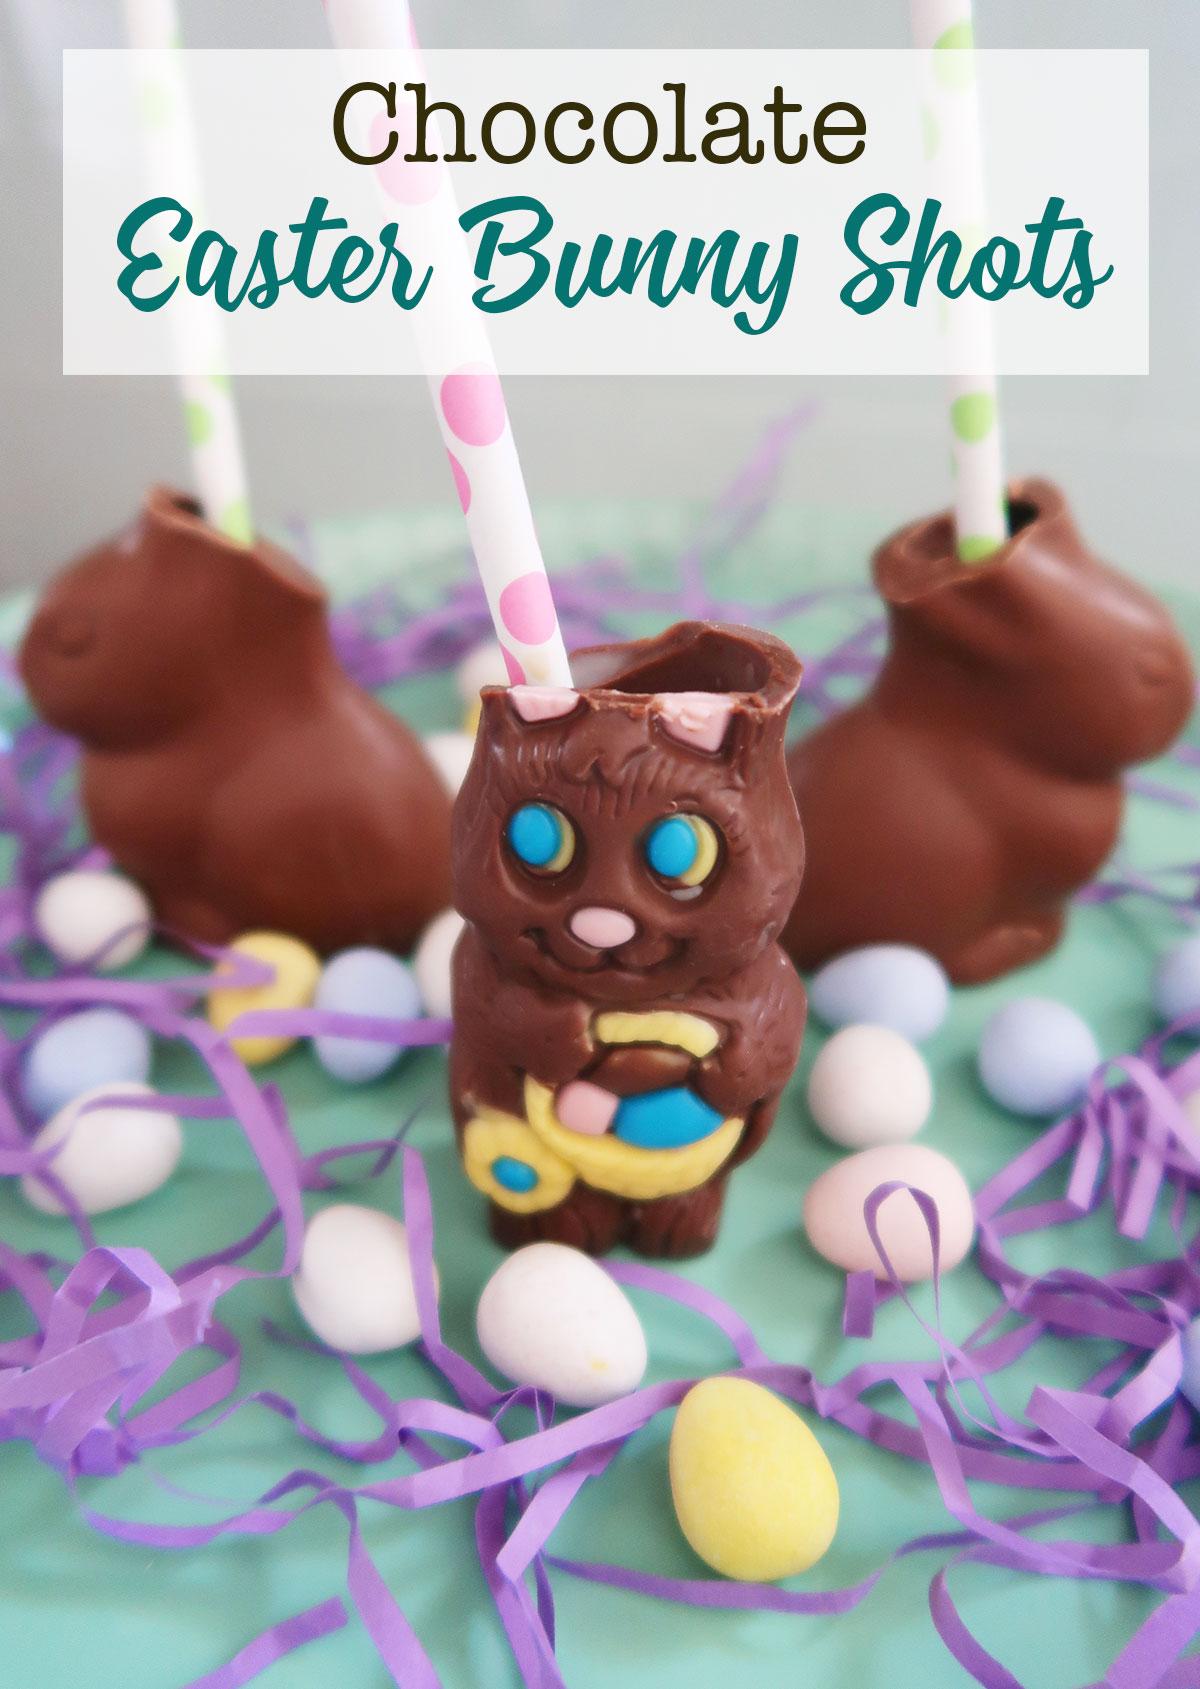 Chocolate-easter-bunny-shot.jpg